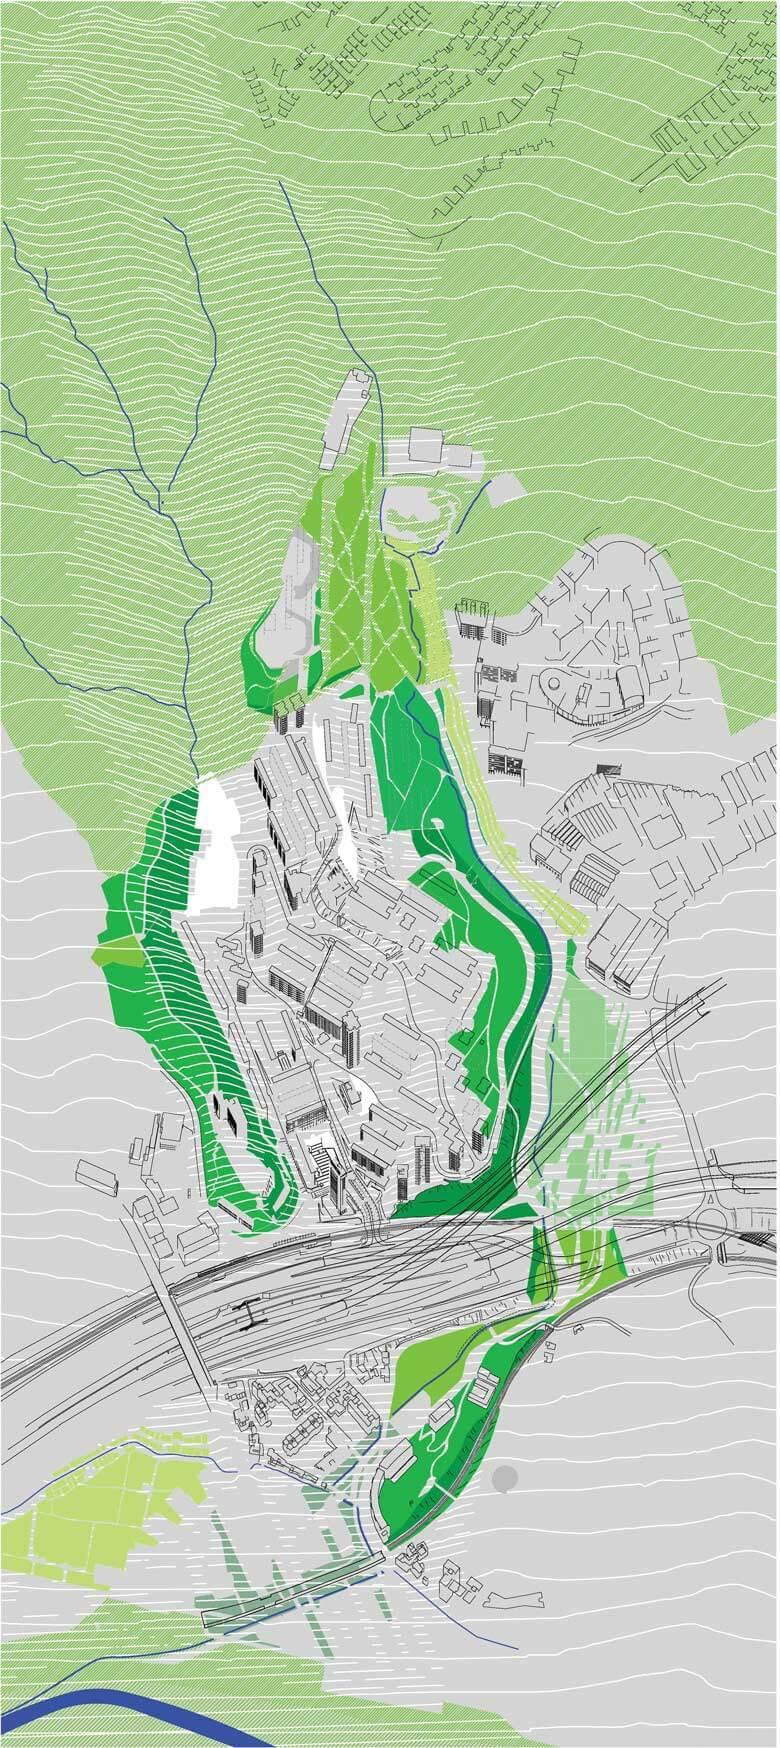 Camí de l'Aigua - verds @Marc García-Durán, arquitecto